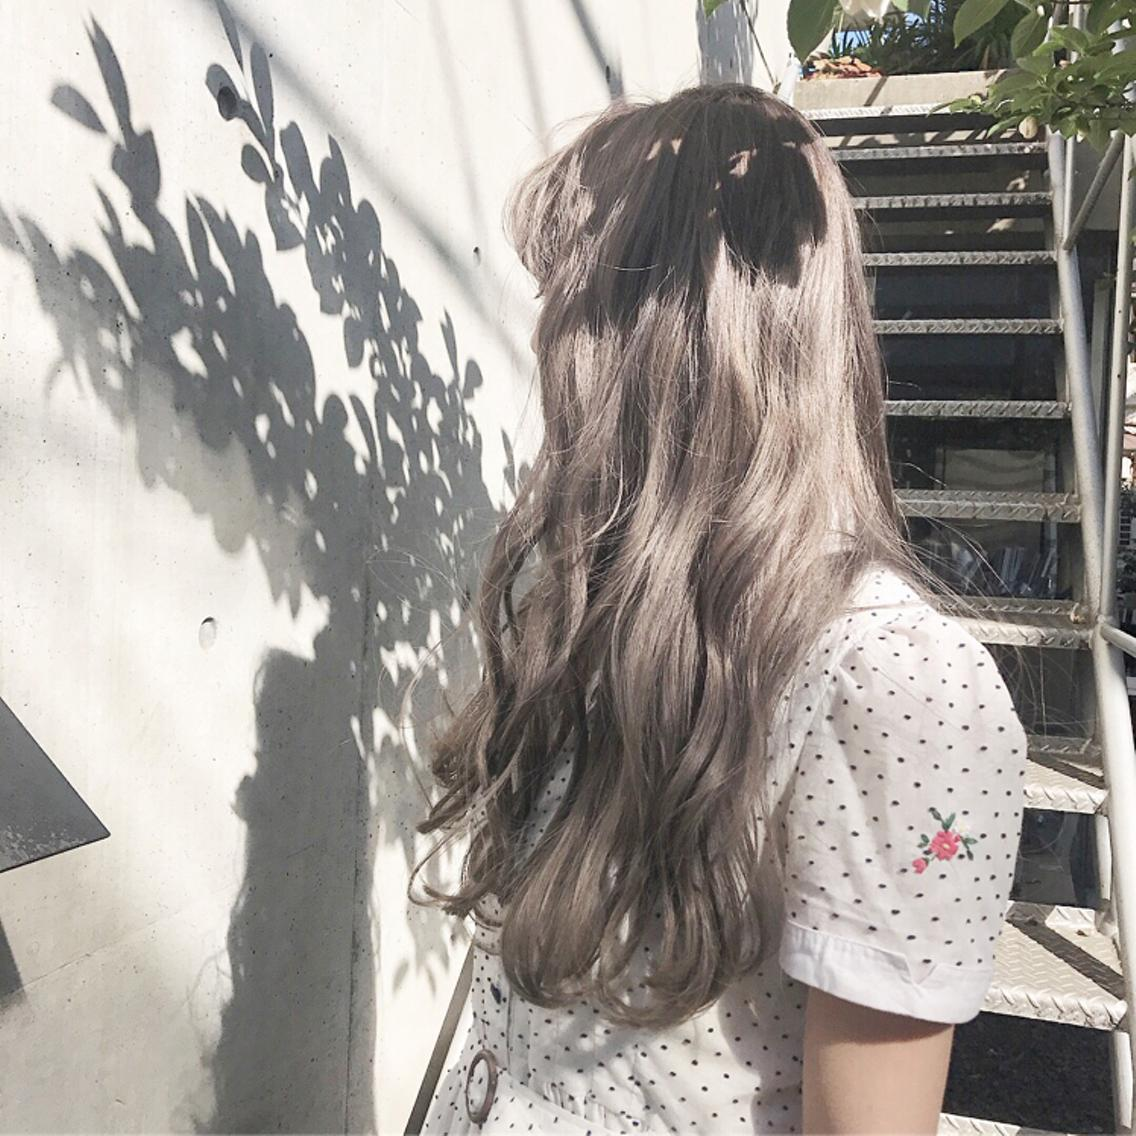 fifth所属・安慶名 琳 大人気ミルクティーの掲載